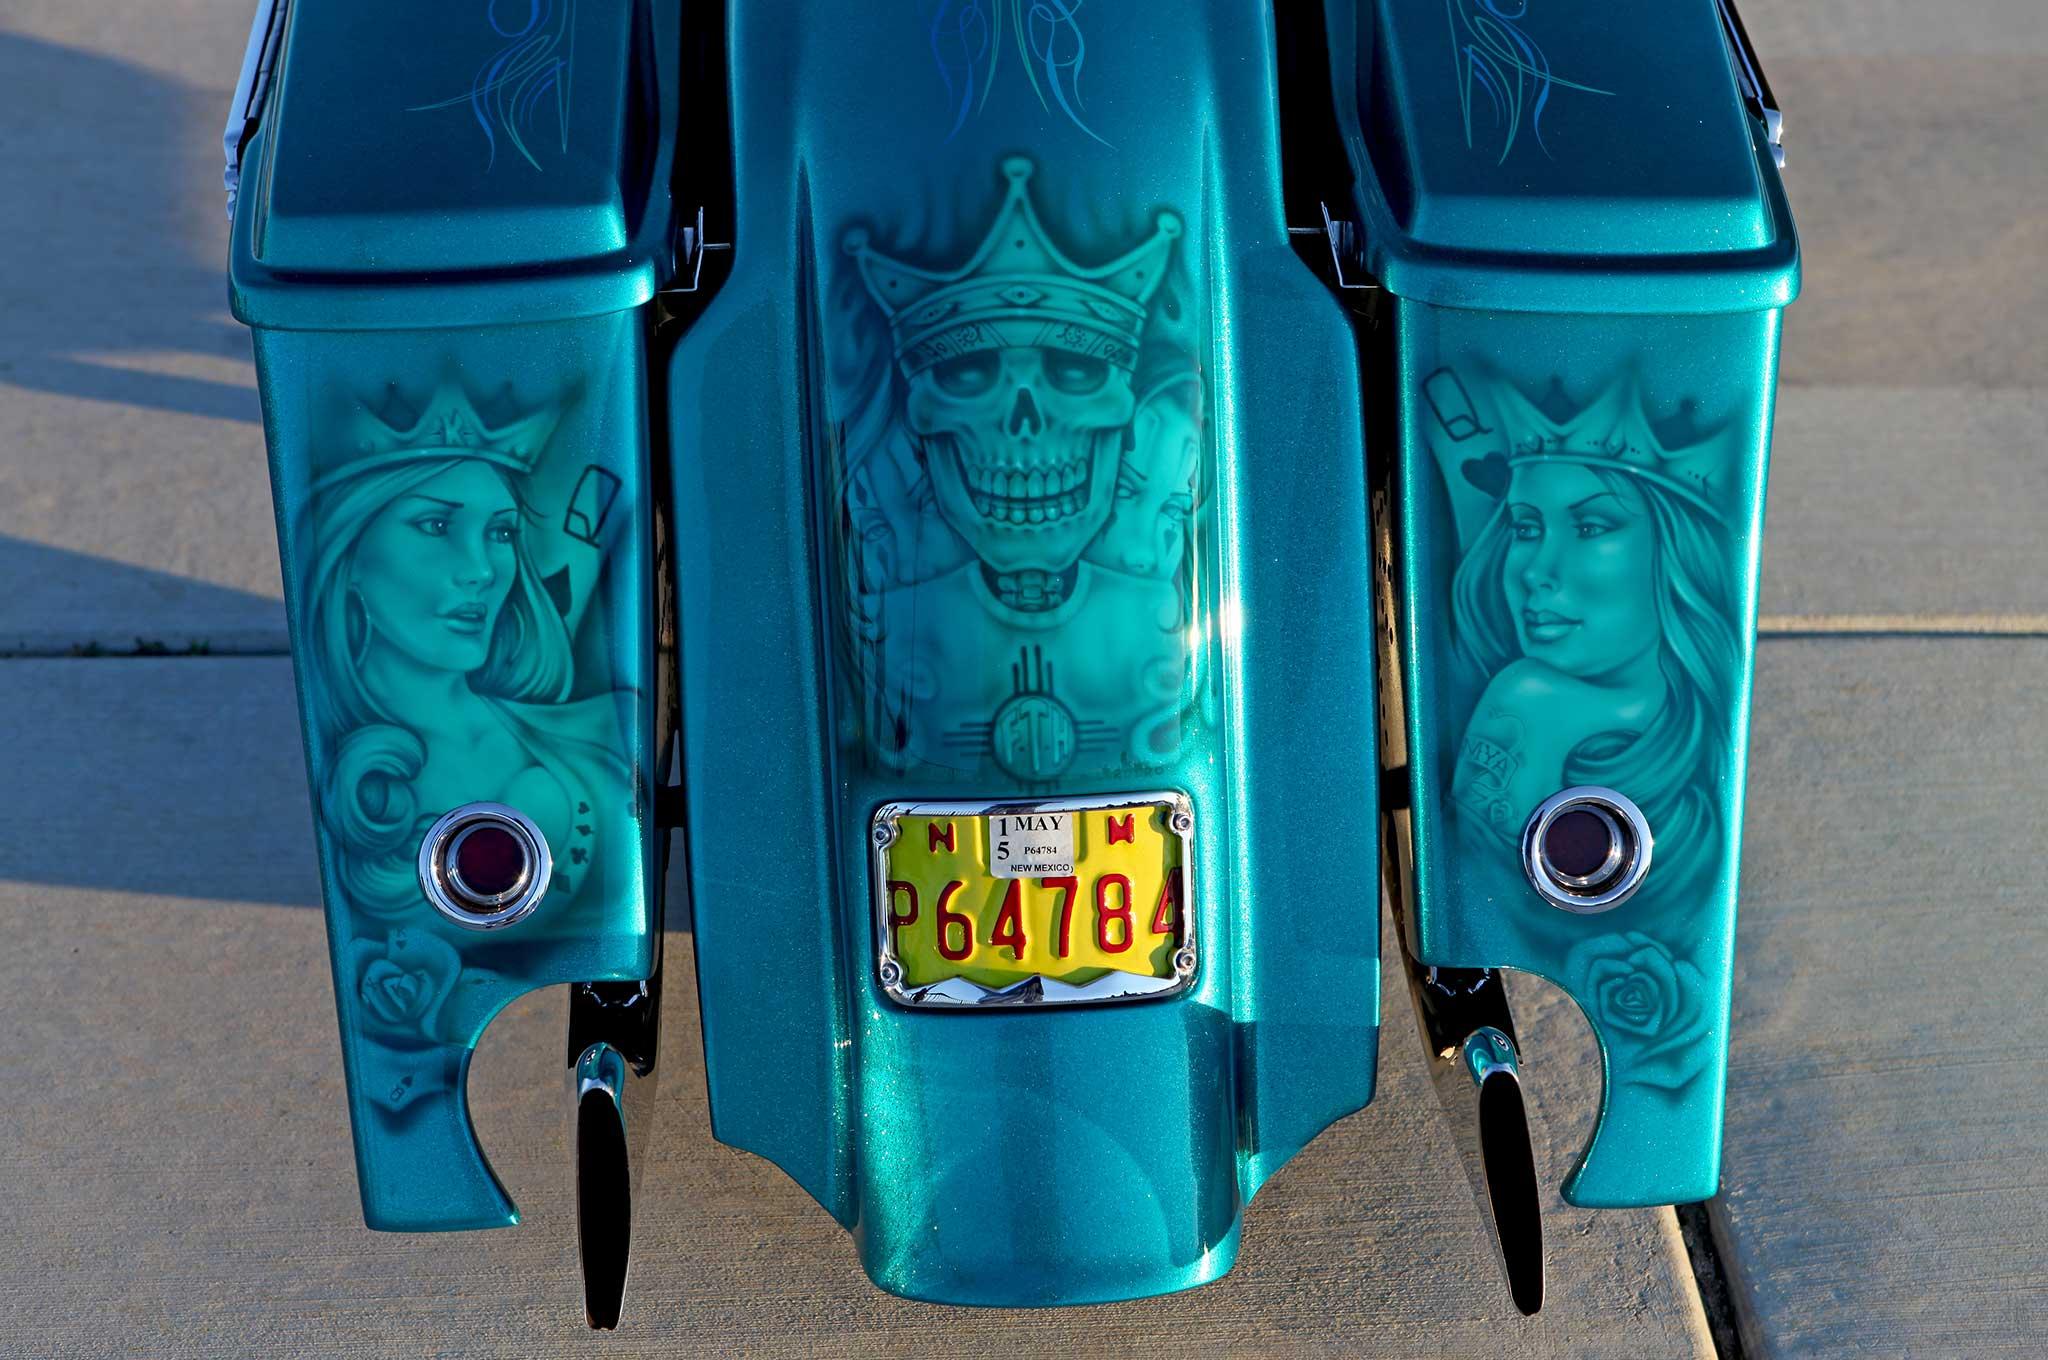 Lowrider 2004 Road King Fuse Box 0172004 Harley Davidson Murals 0162004 Smt Machine Chrome Wheel 0022004